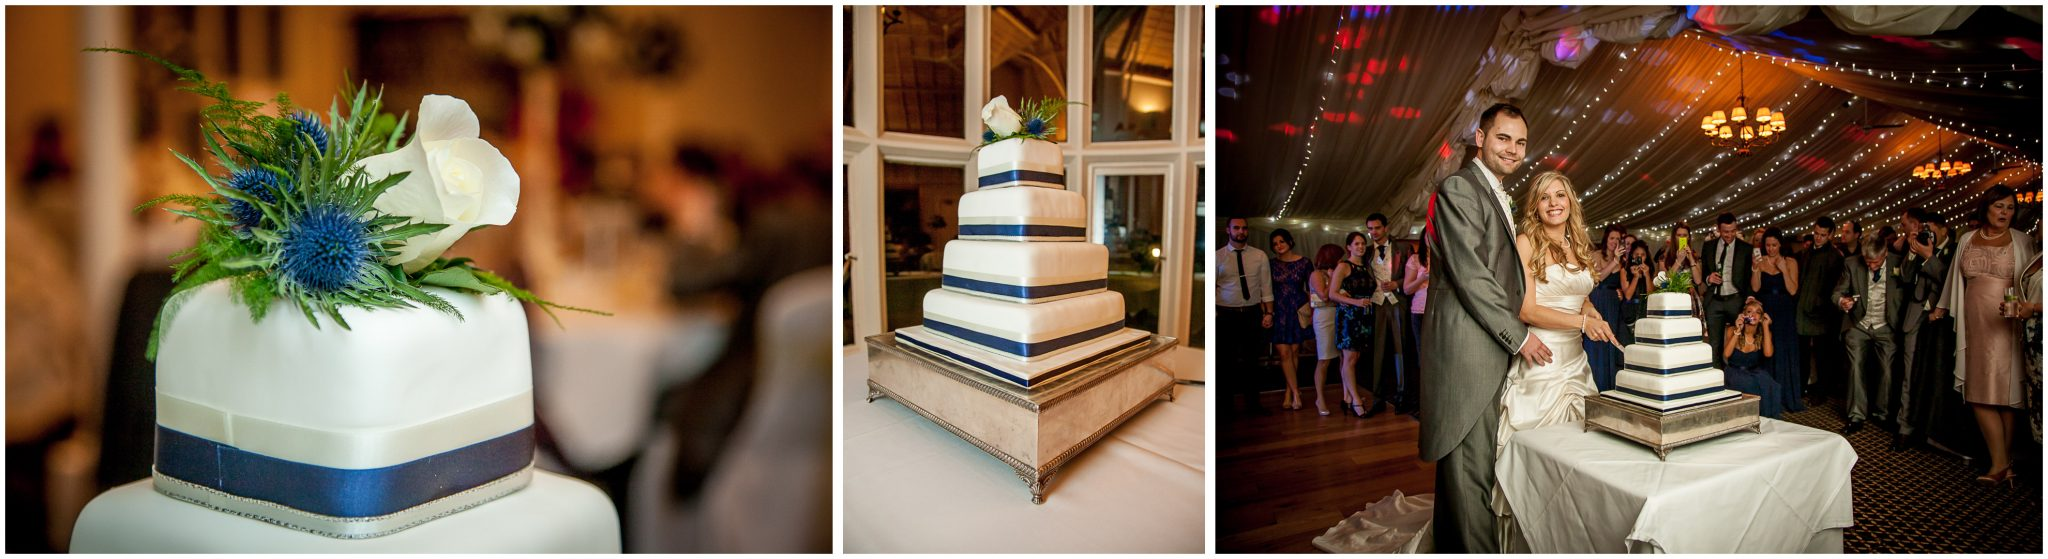 Audleys Wood wedding photography cutting the cake